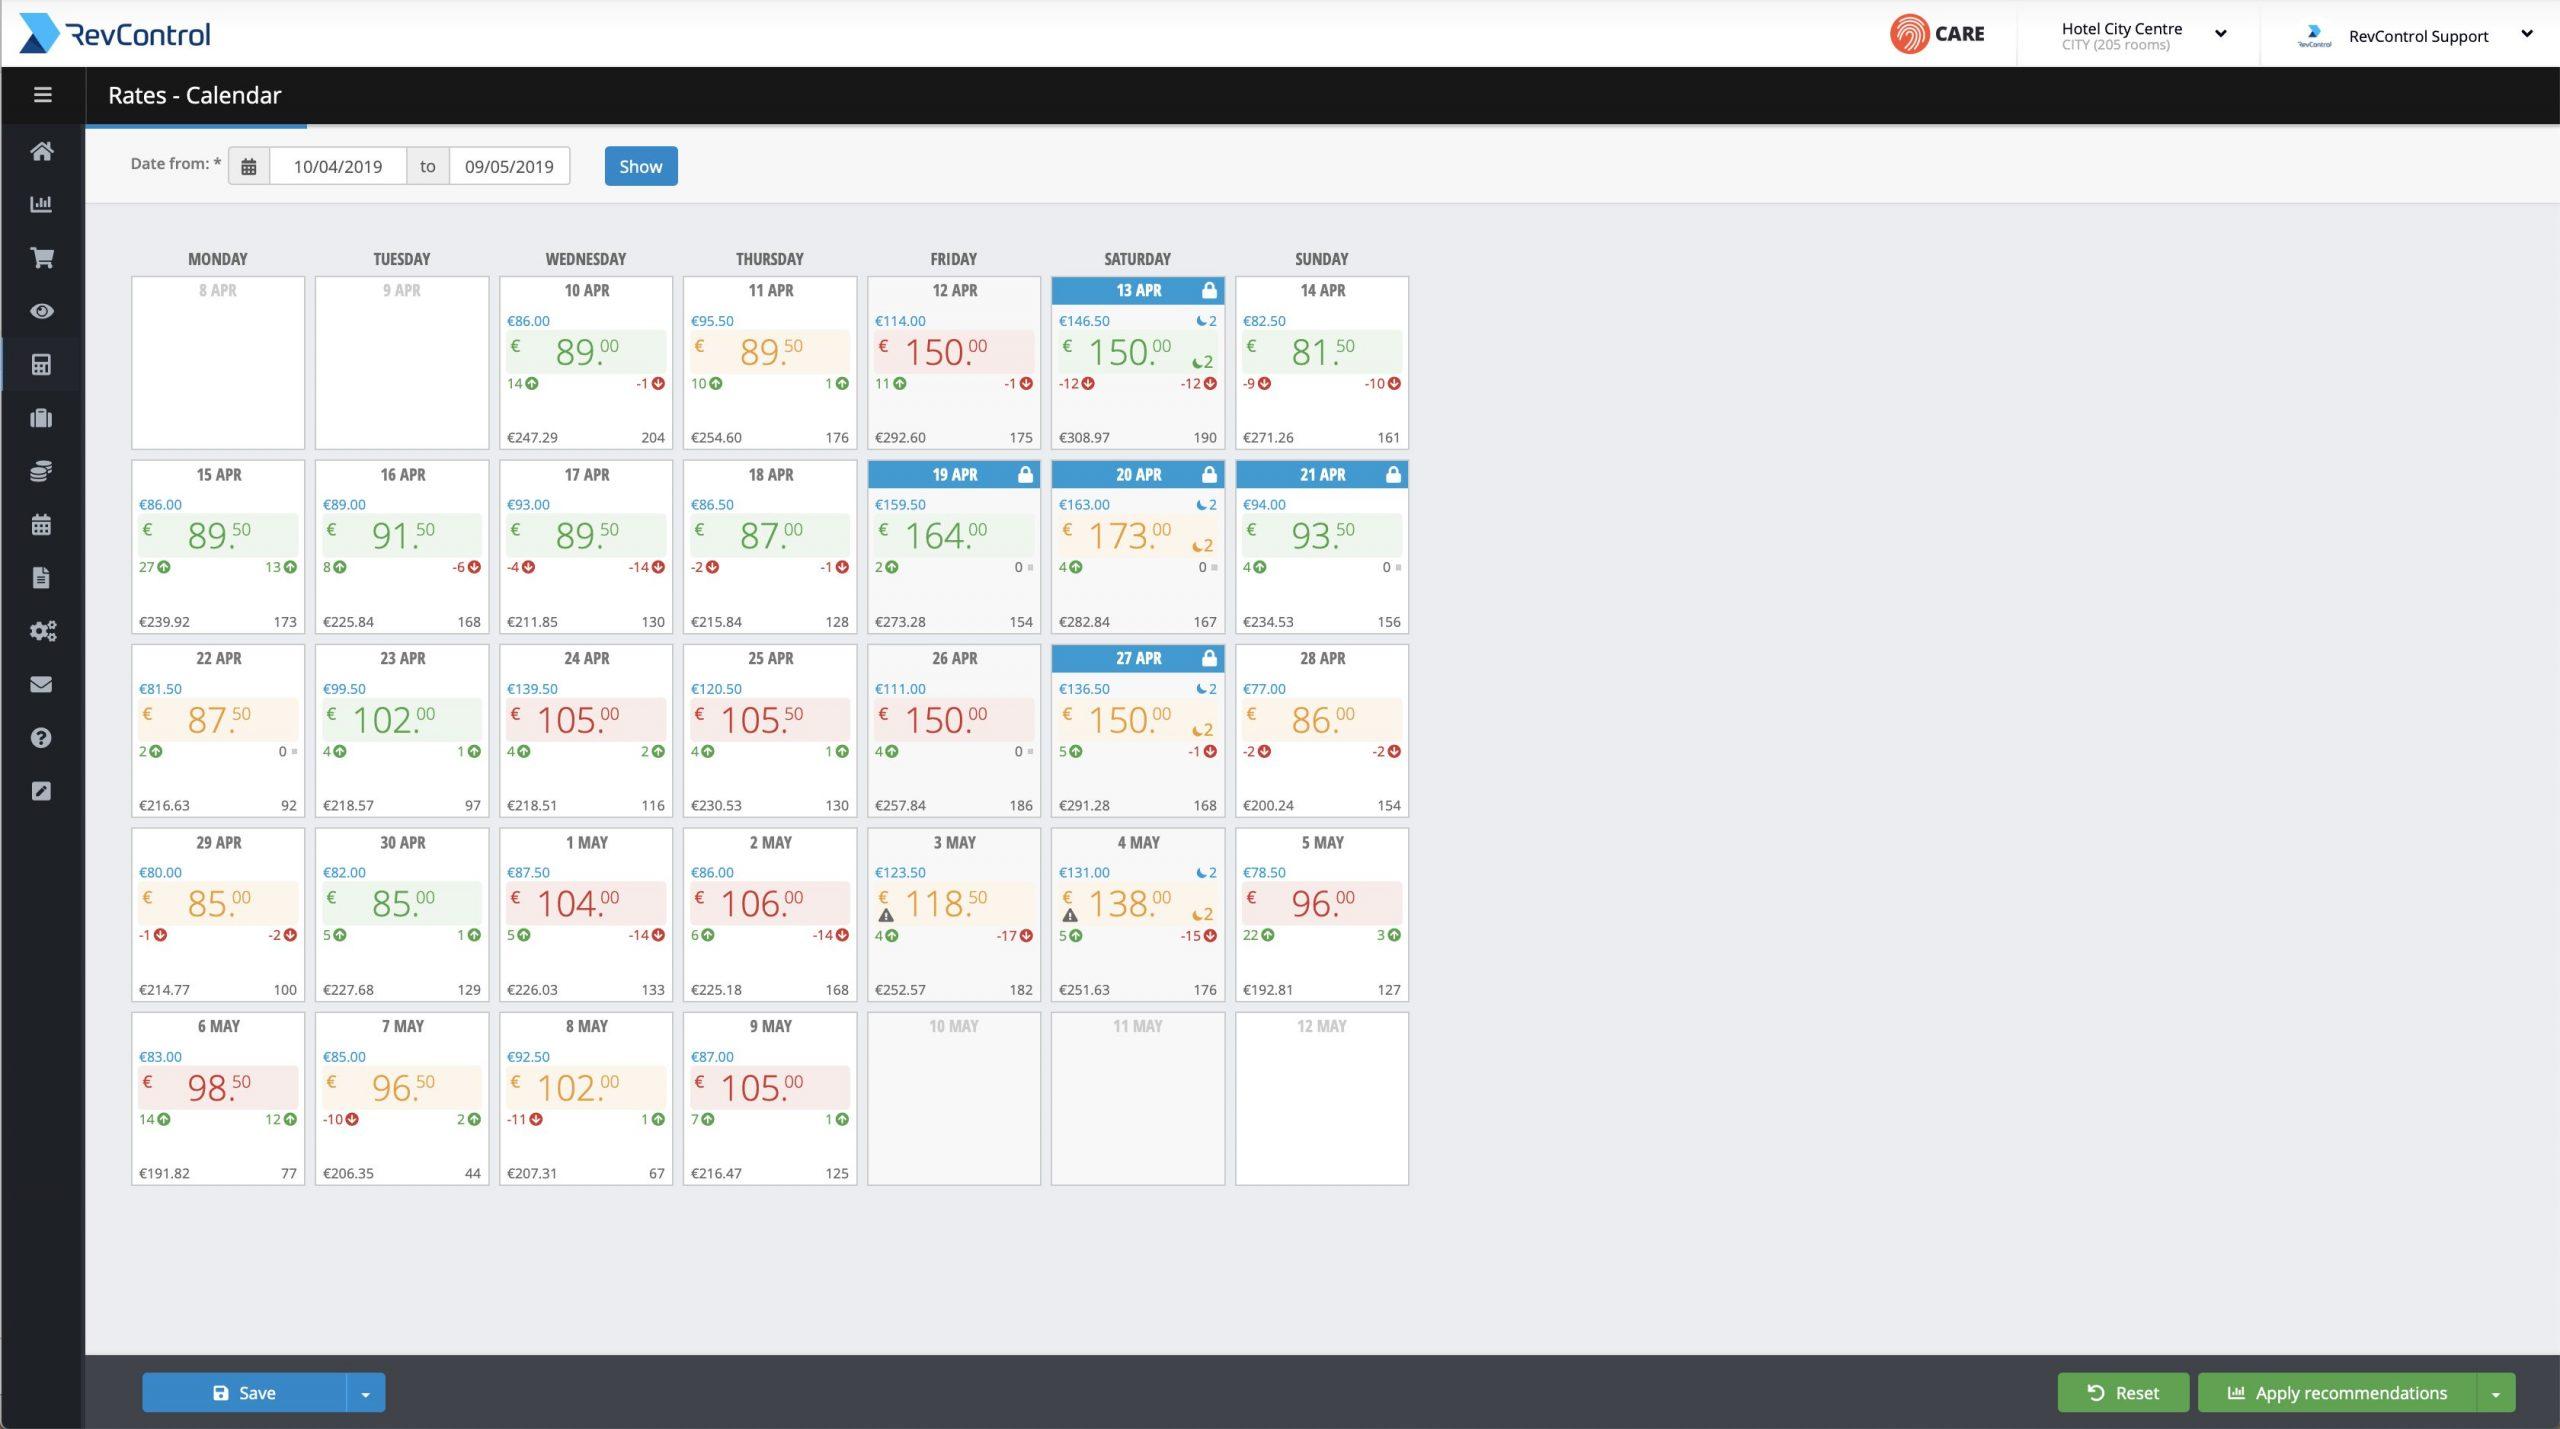 Rate-Calendar